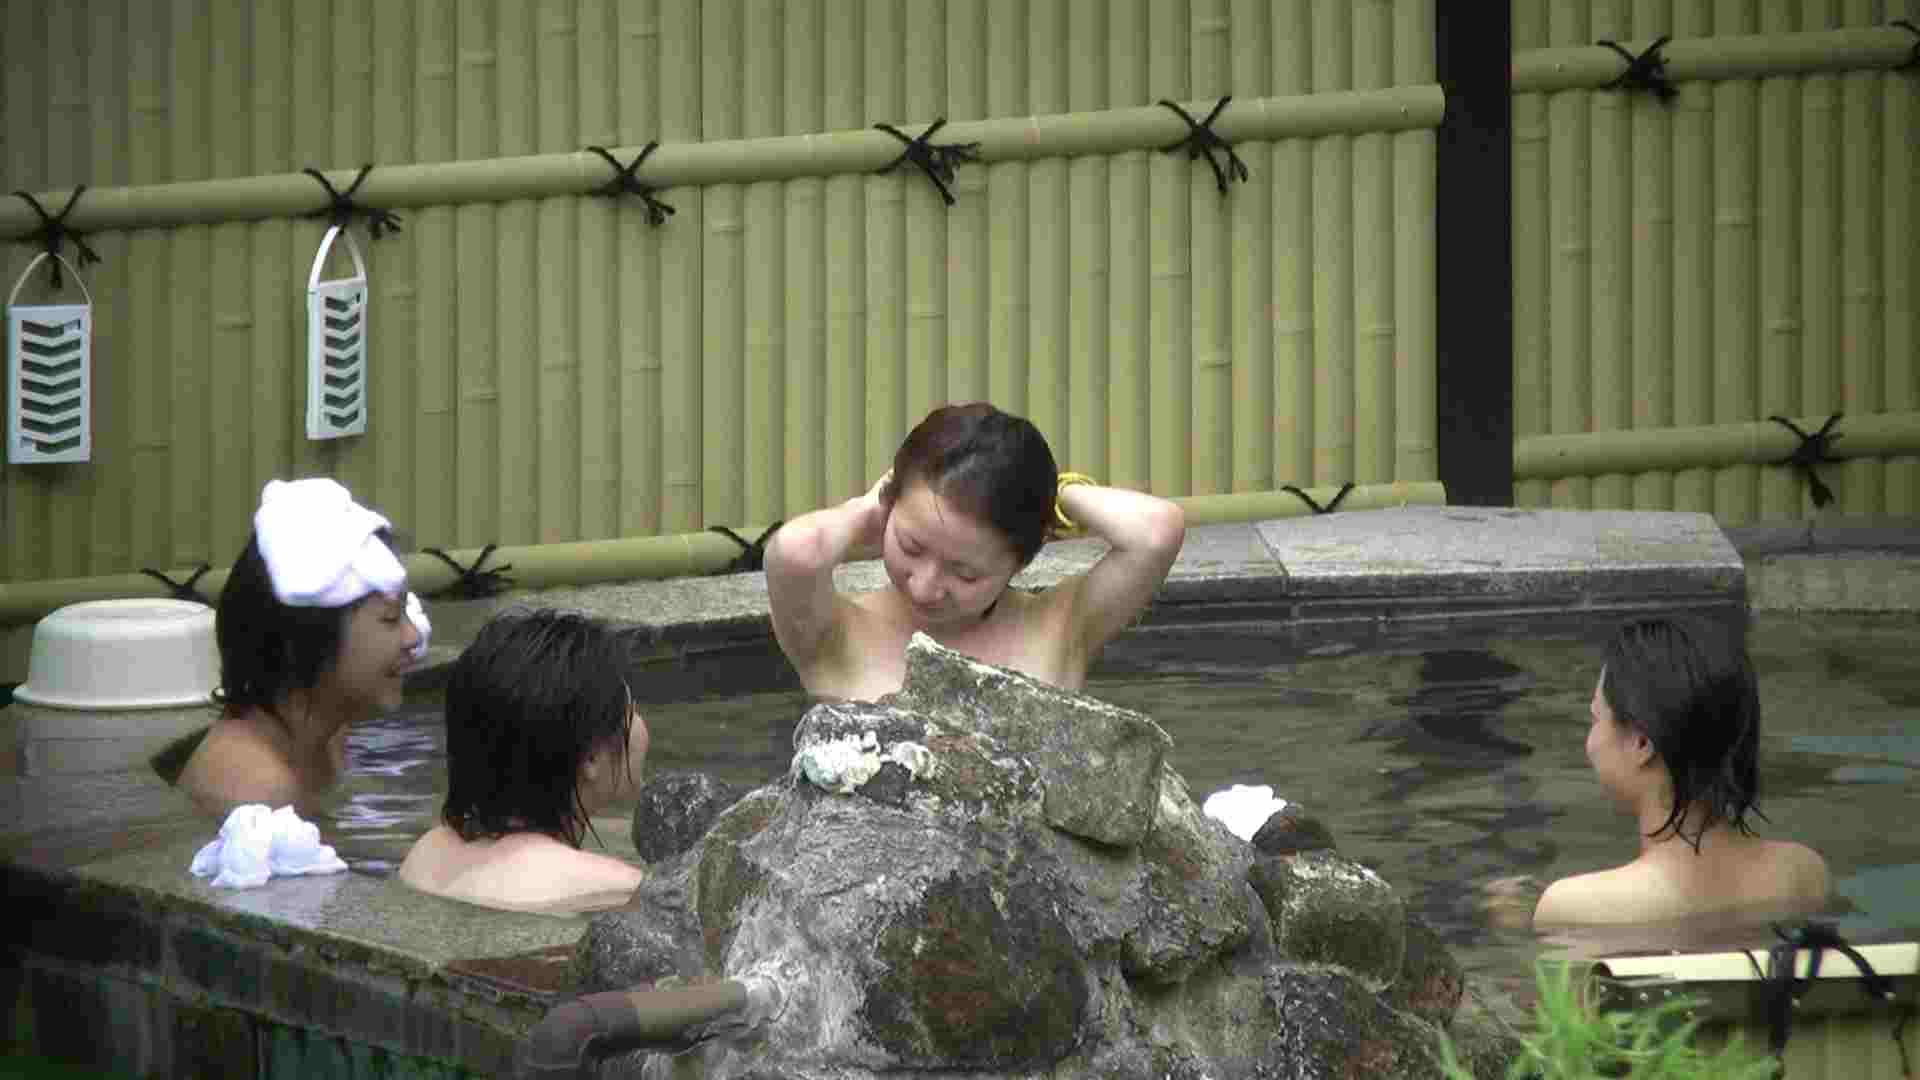 Aquaな露天風呂Vol.181 OLのエロ生活 | 露天風呂  40連発 1